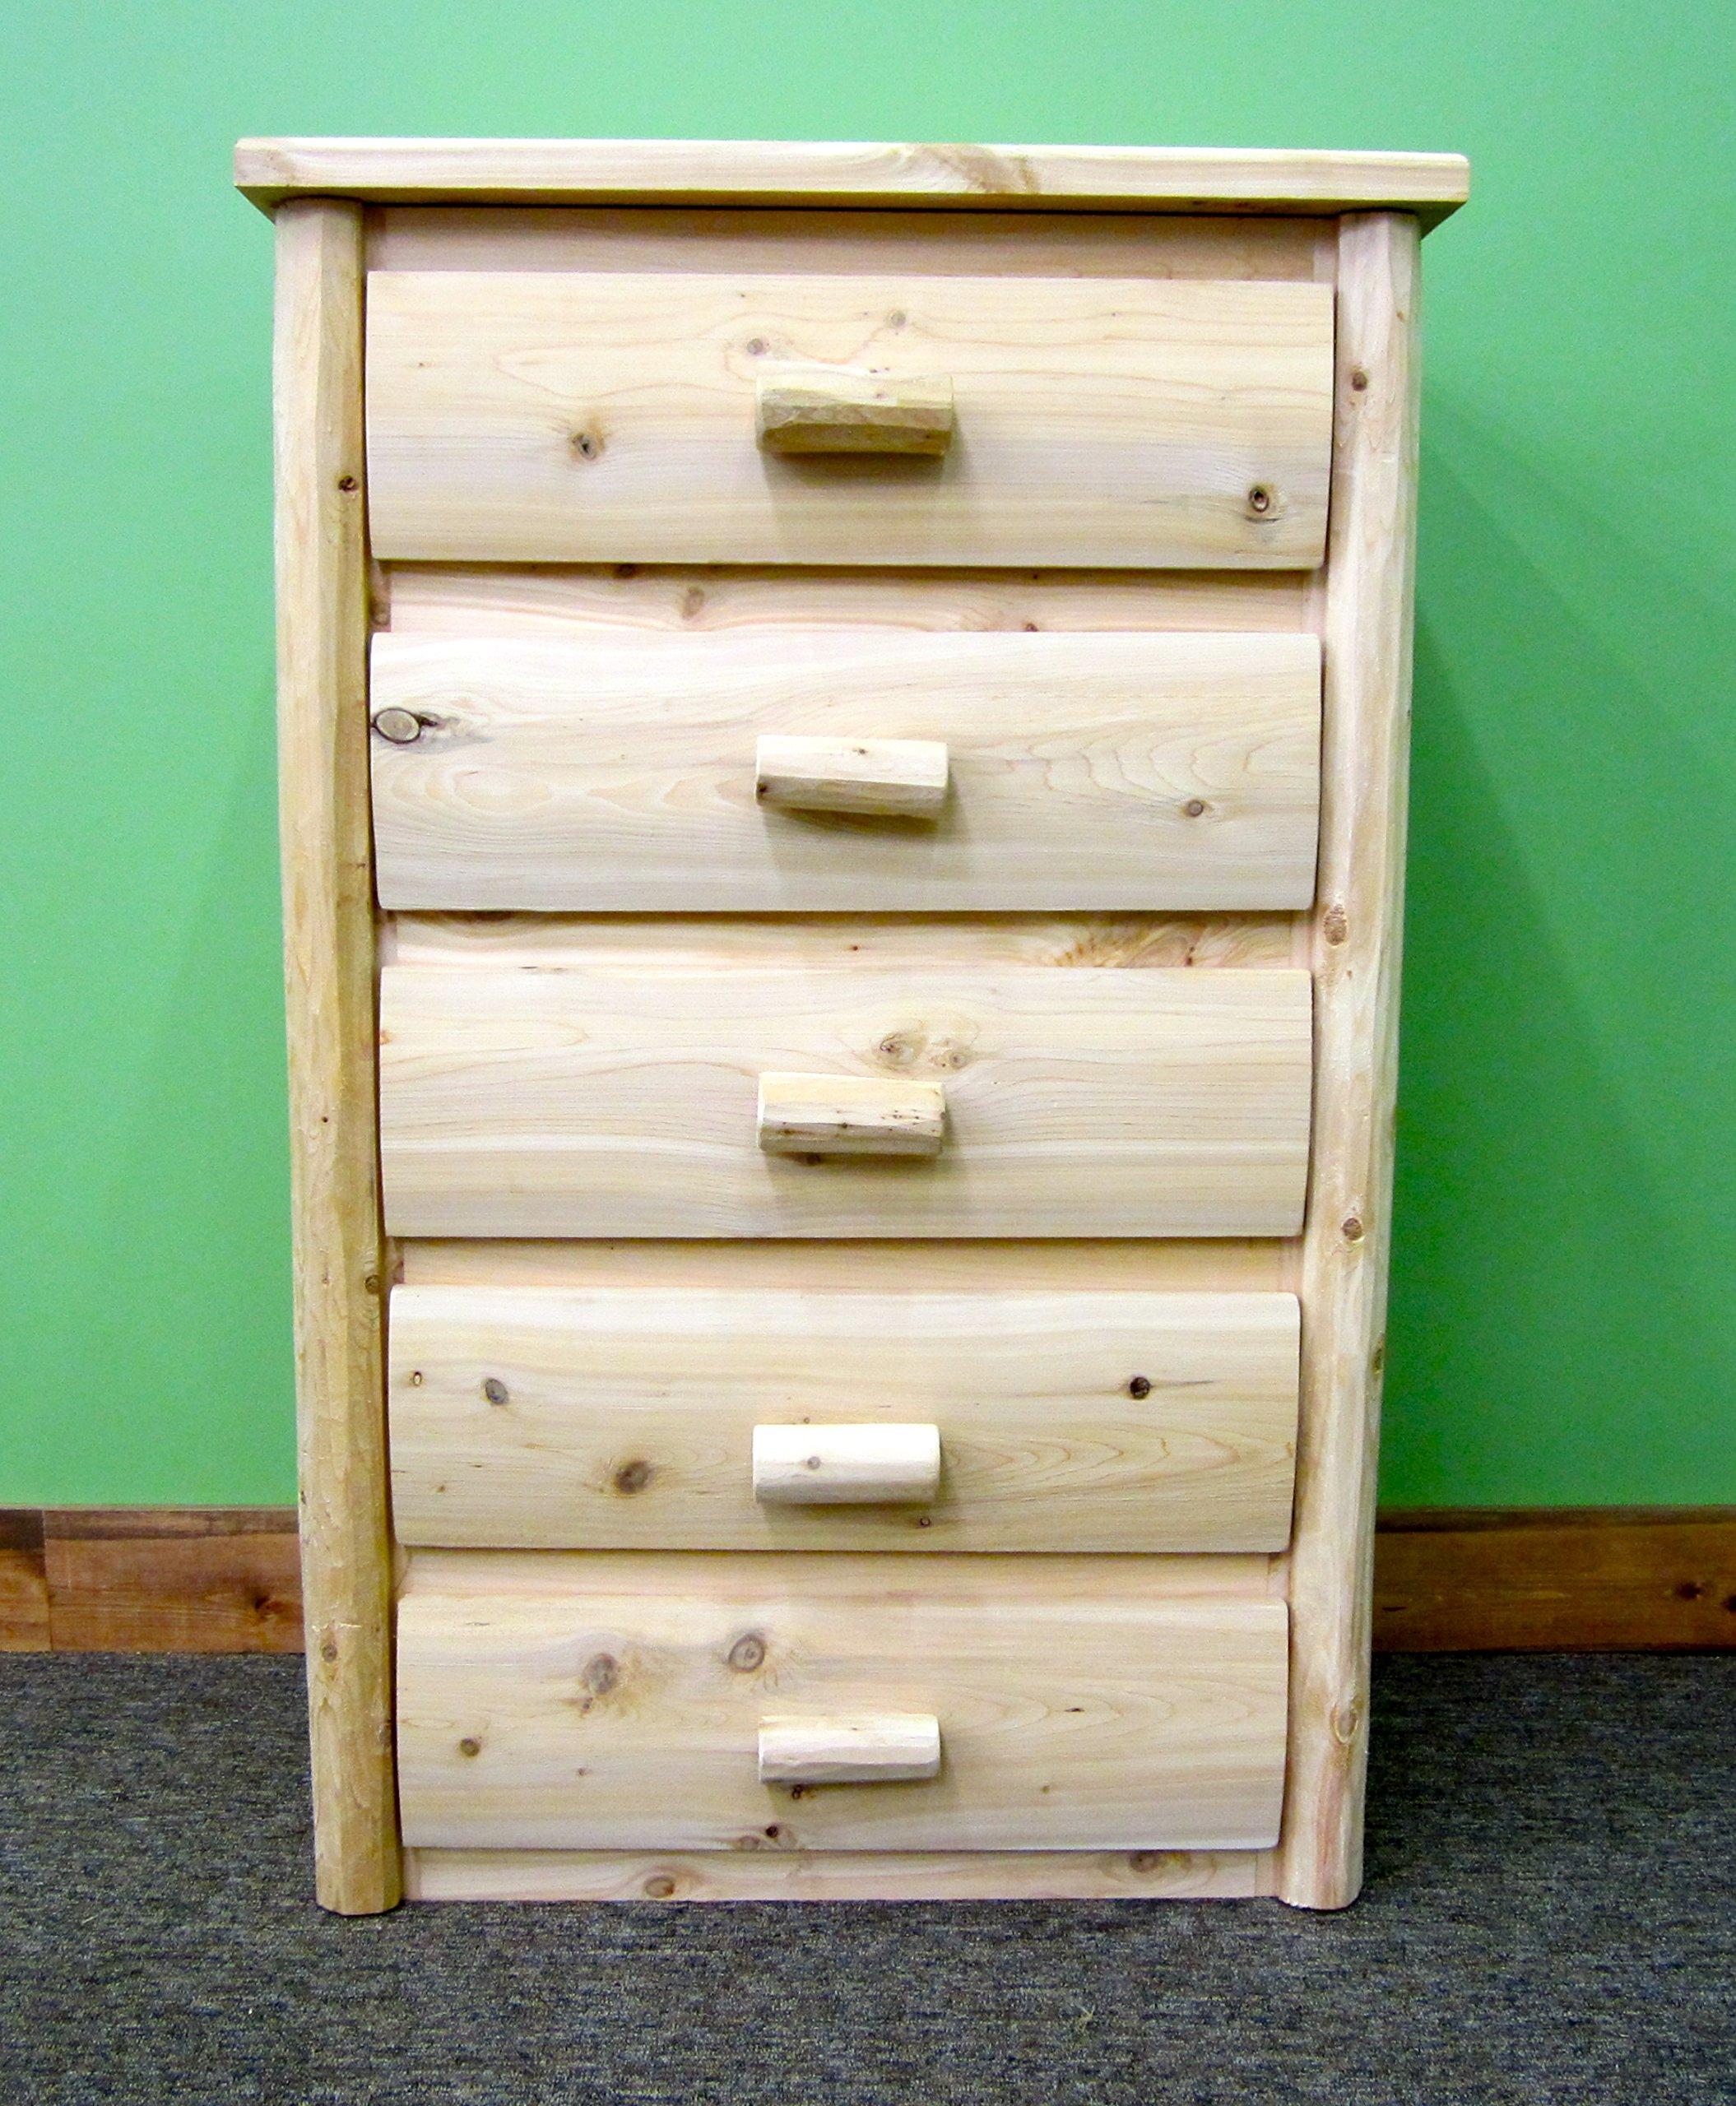 Midwest Log Furniture - Premium Log Dresser - 5 Drawer - Quality, Handcrafted Log Furniture Solid Wood Hardware & EZ Assembly Instructions Included - dressers-bedroom-furniture, bedroom-furniture, bedroom - 91gwv9NCqyL -